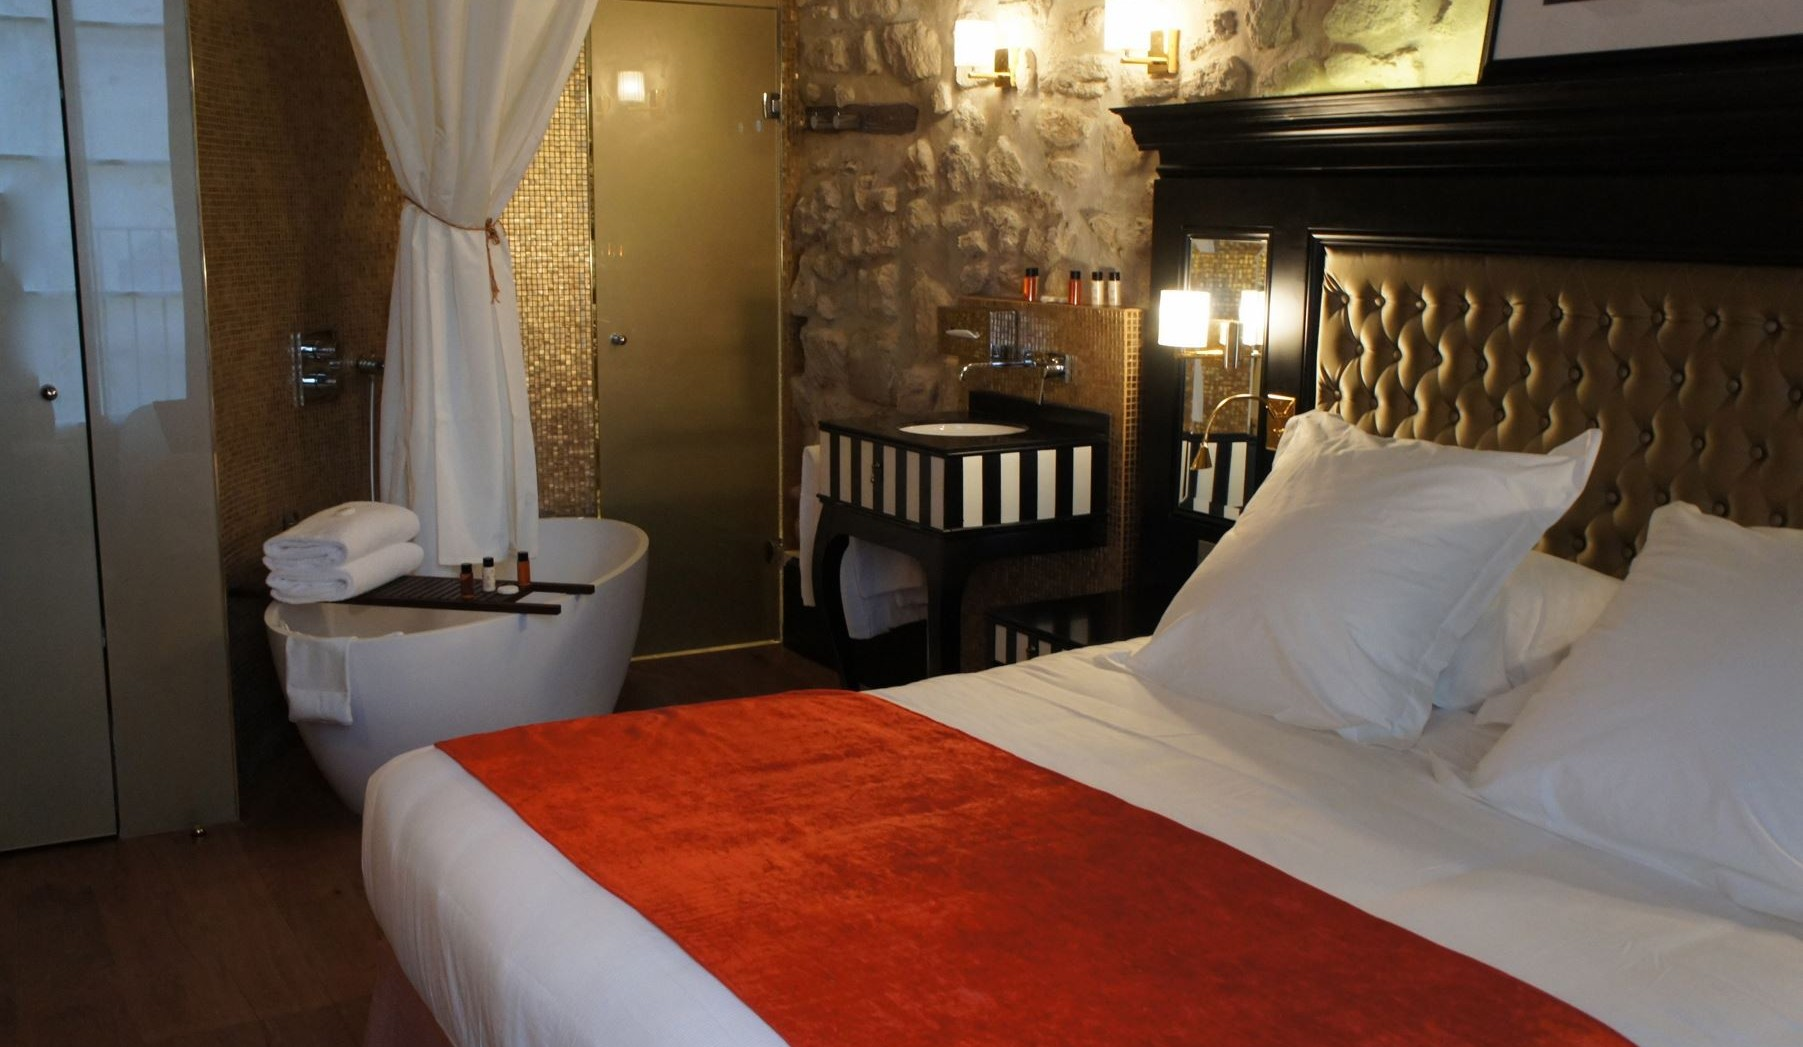 Hotel Moins De  Euros Paris